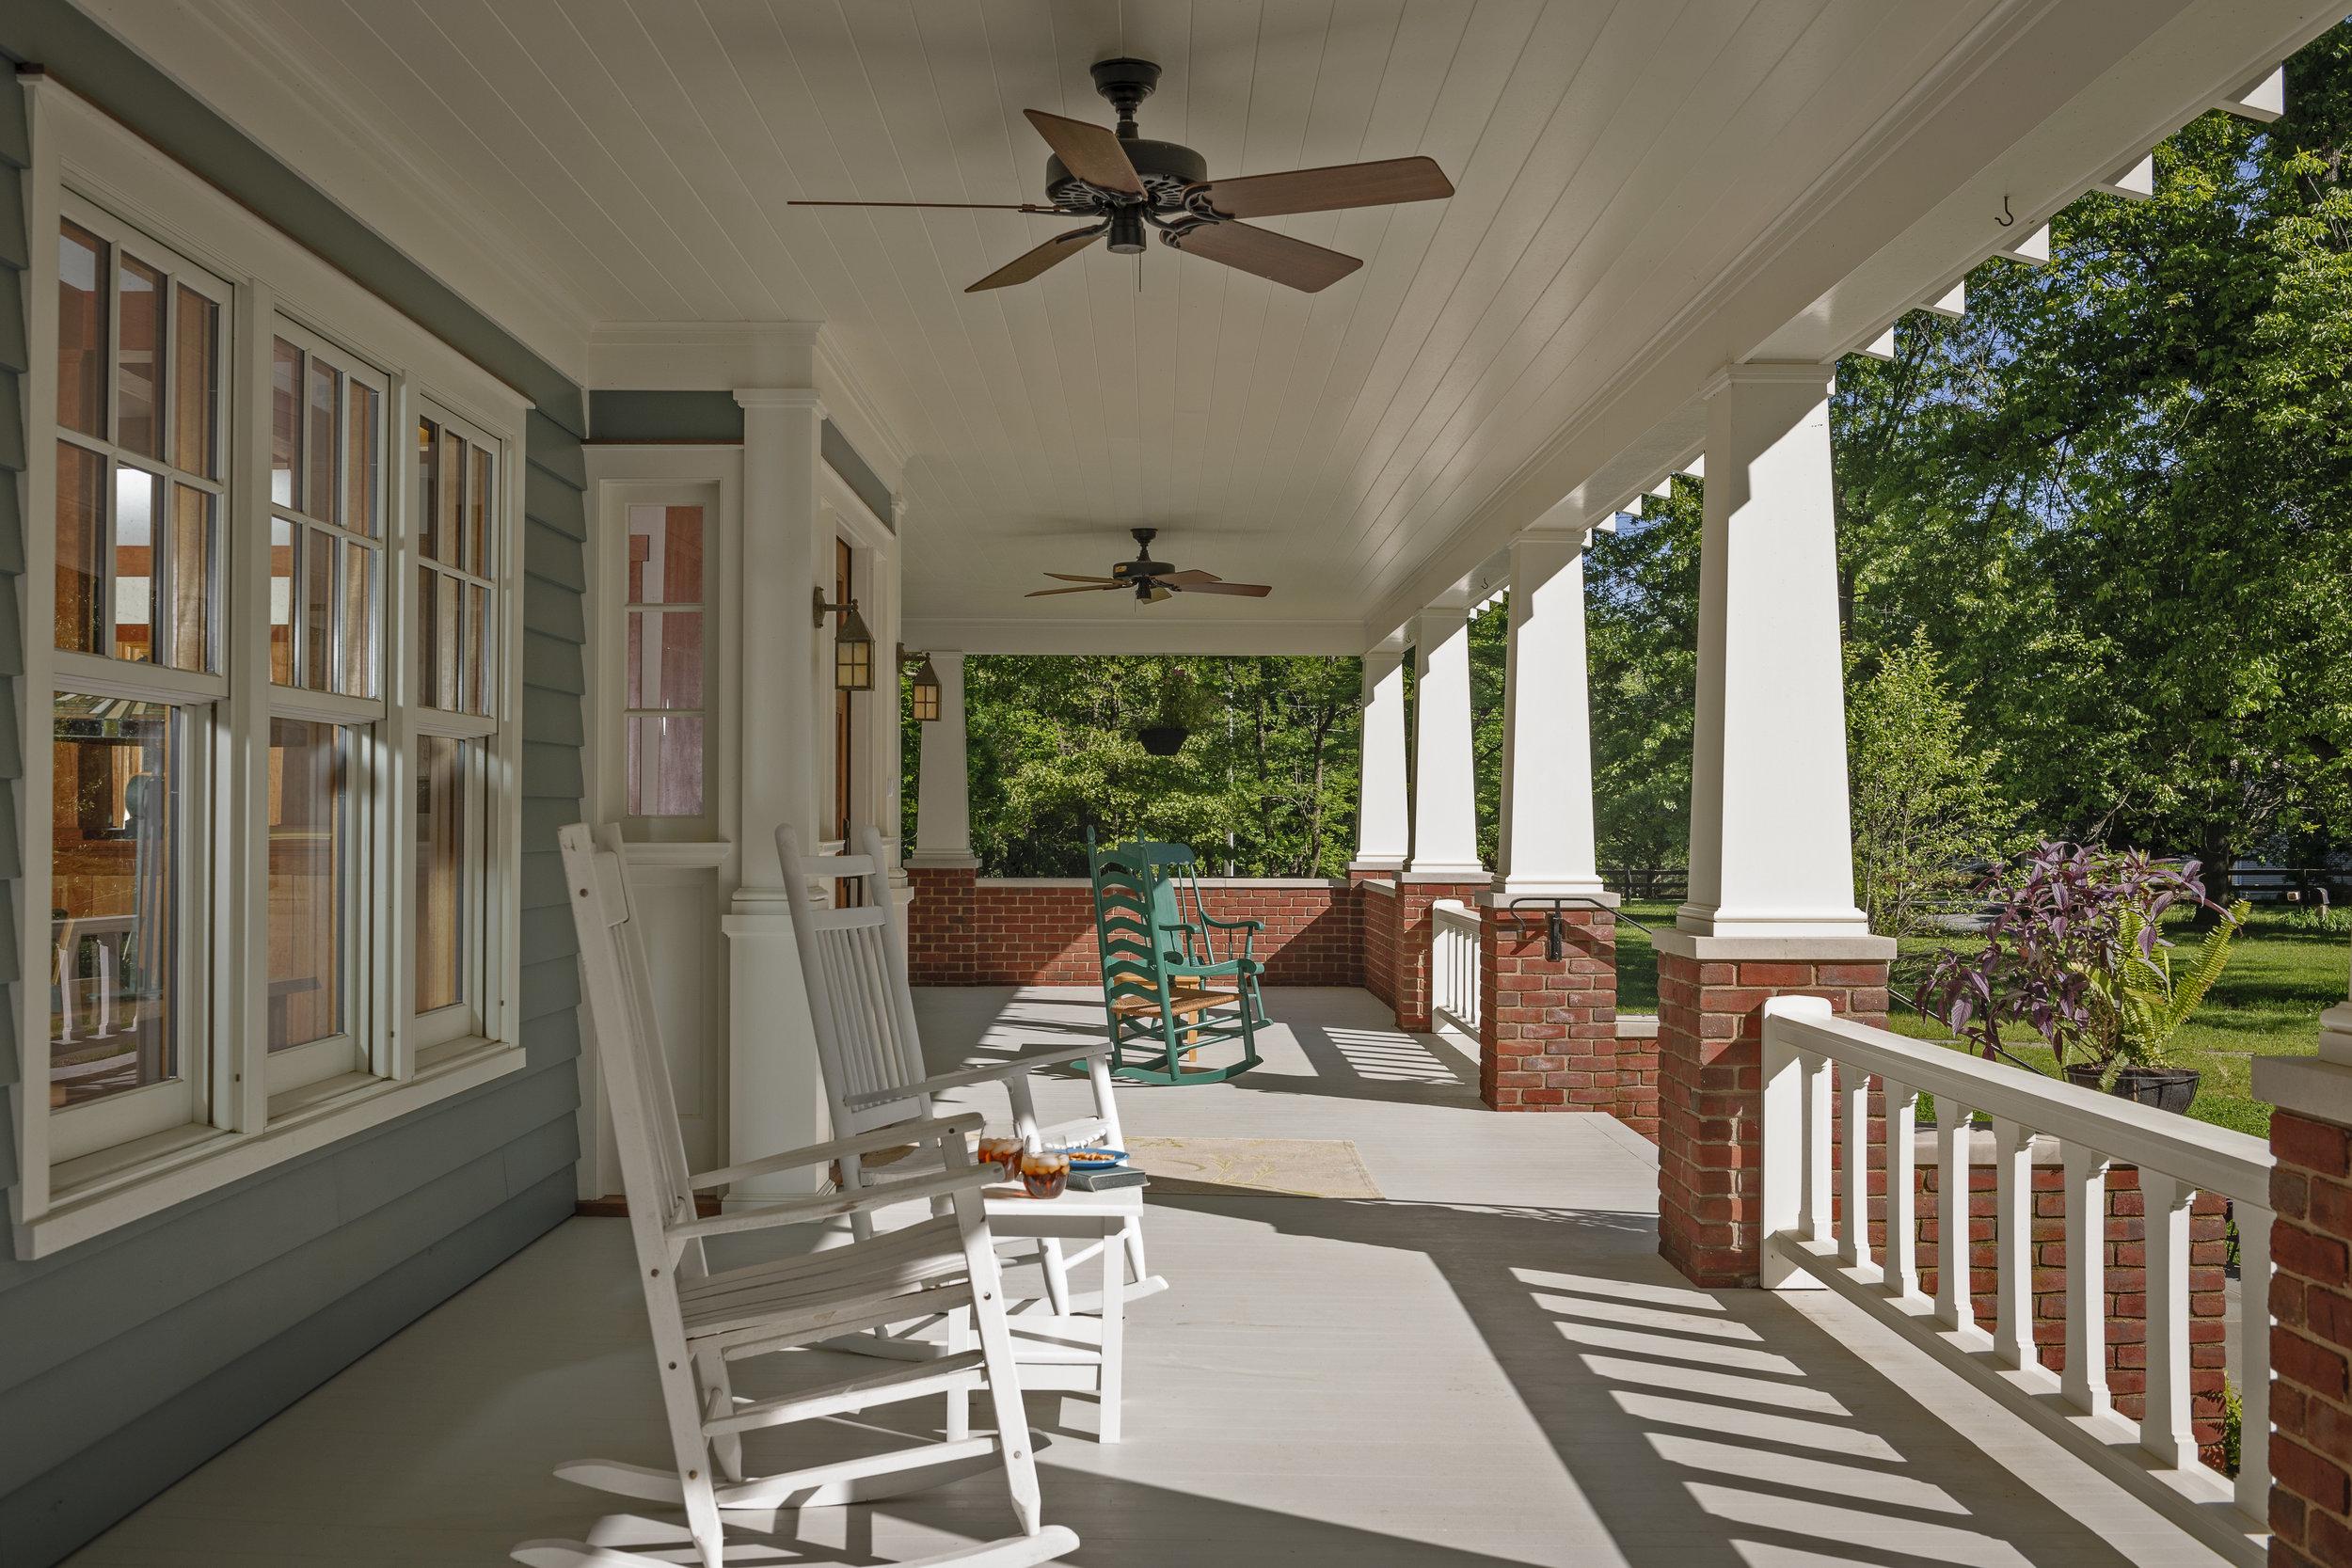 Clites_Craftsman_bungalow_frontporch.jpg